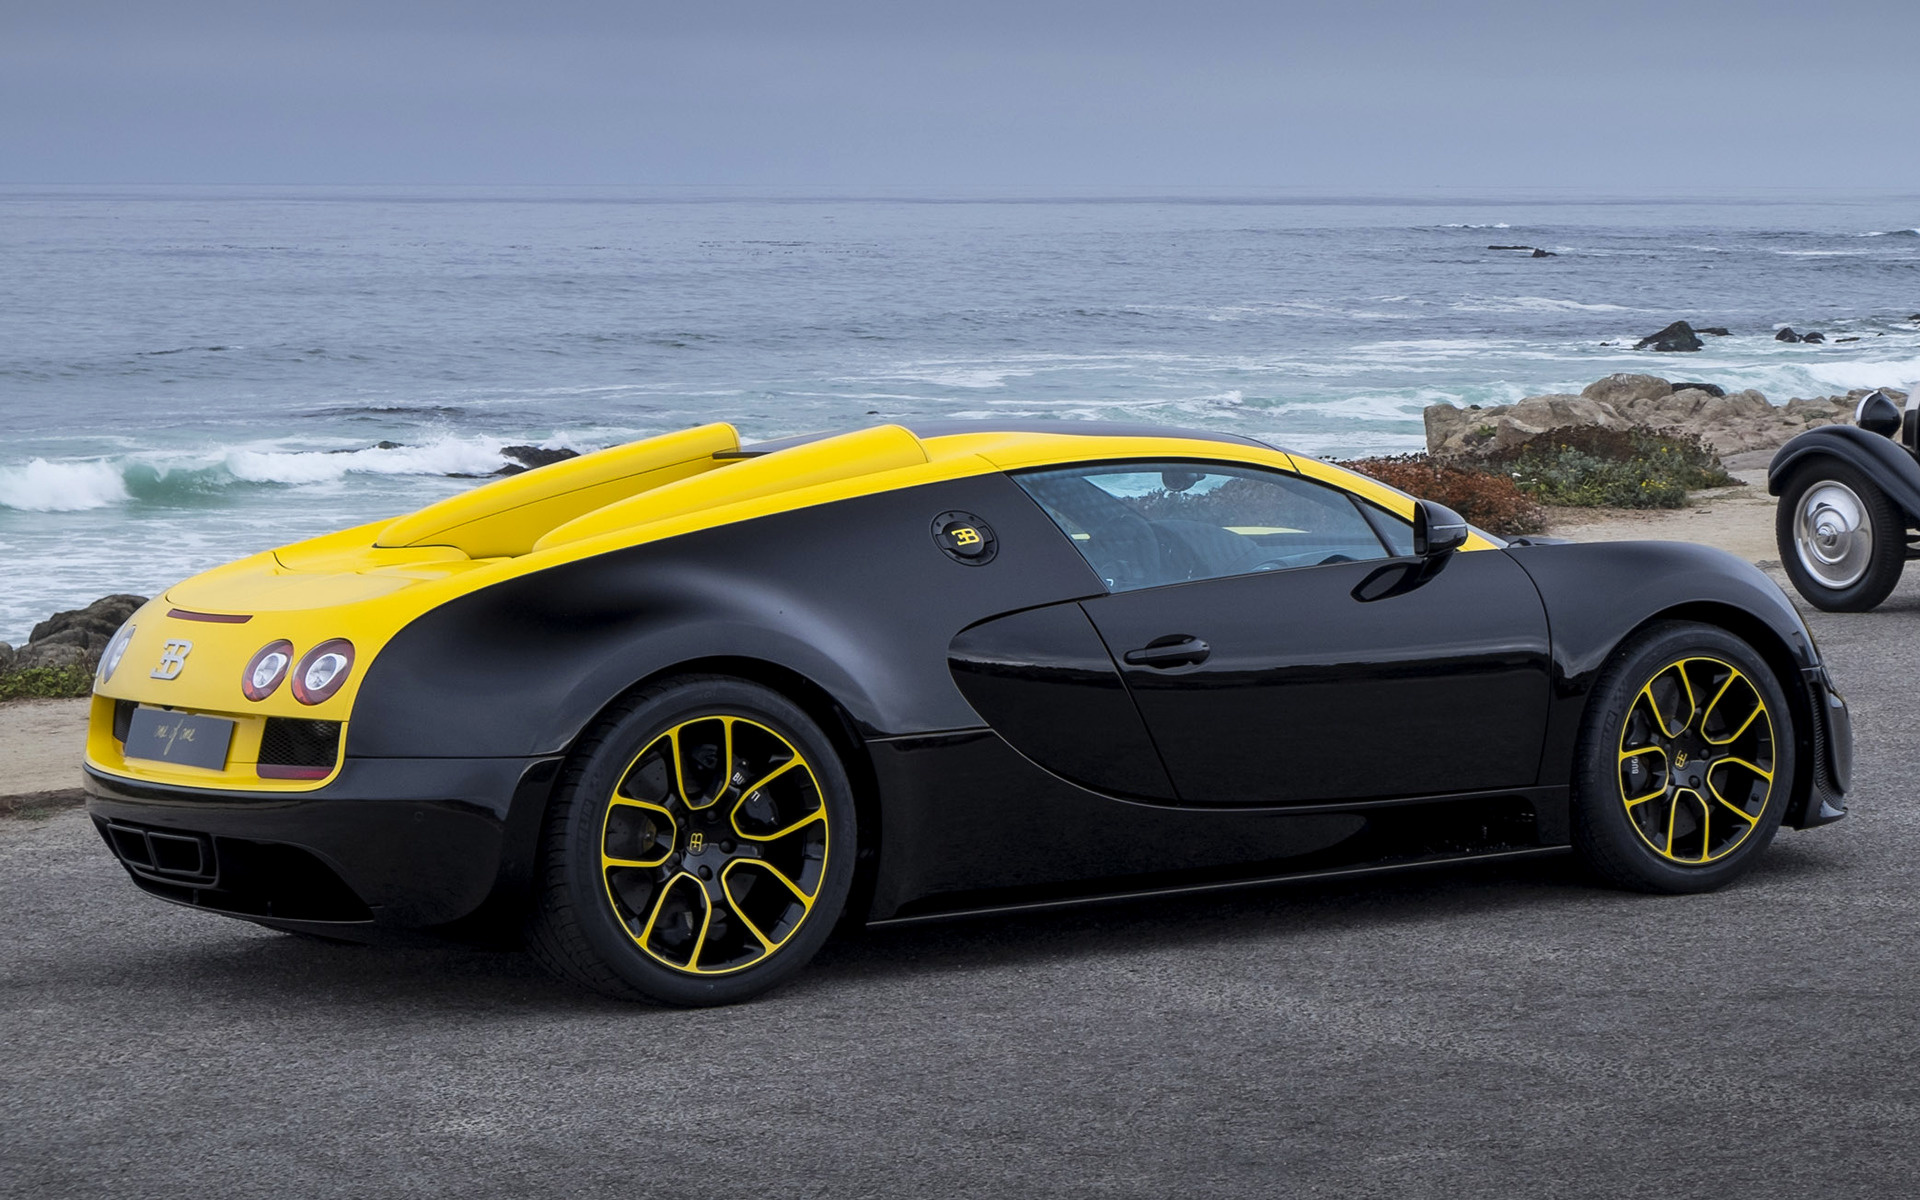 Bugatti Veyron Super Sports Car Wallpaper | HD Car